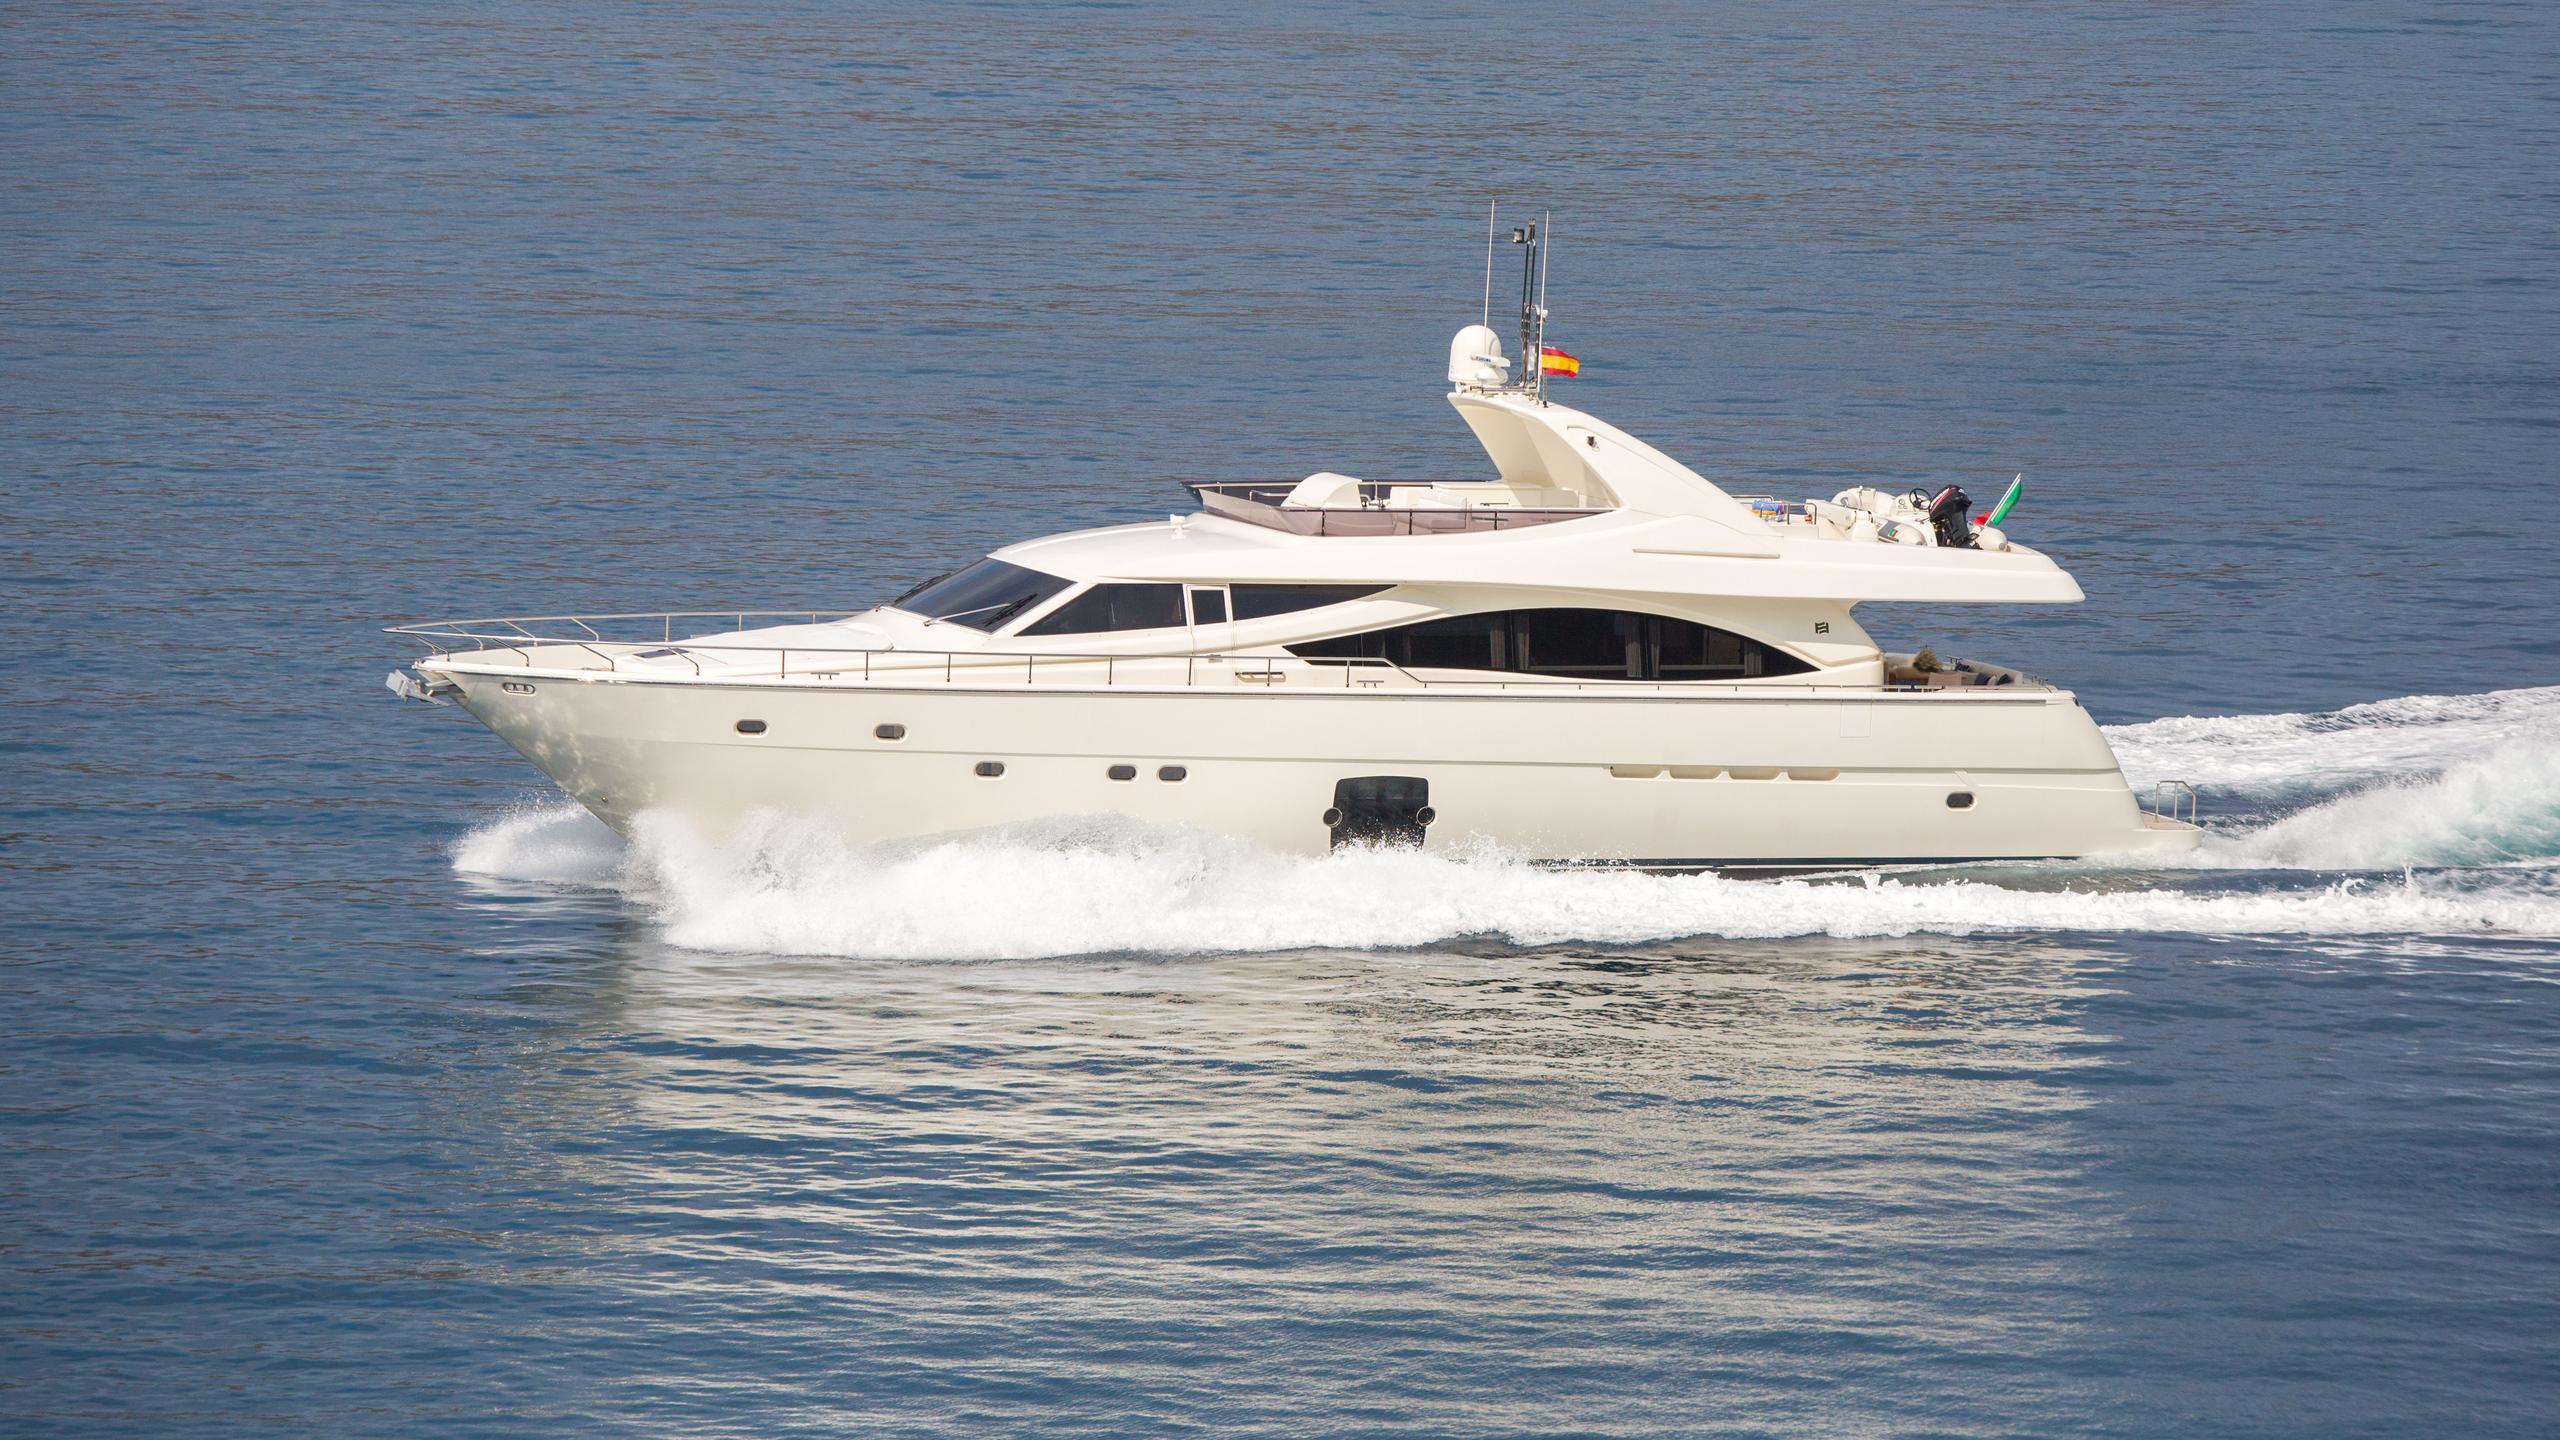 monticello-ii-yacht-at-sea